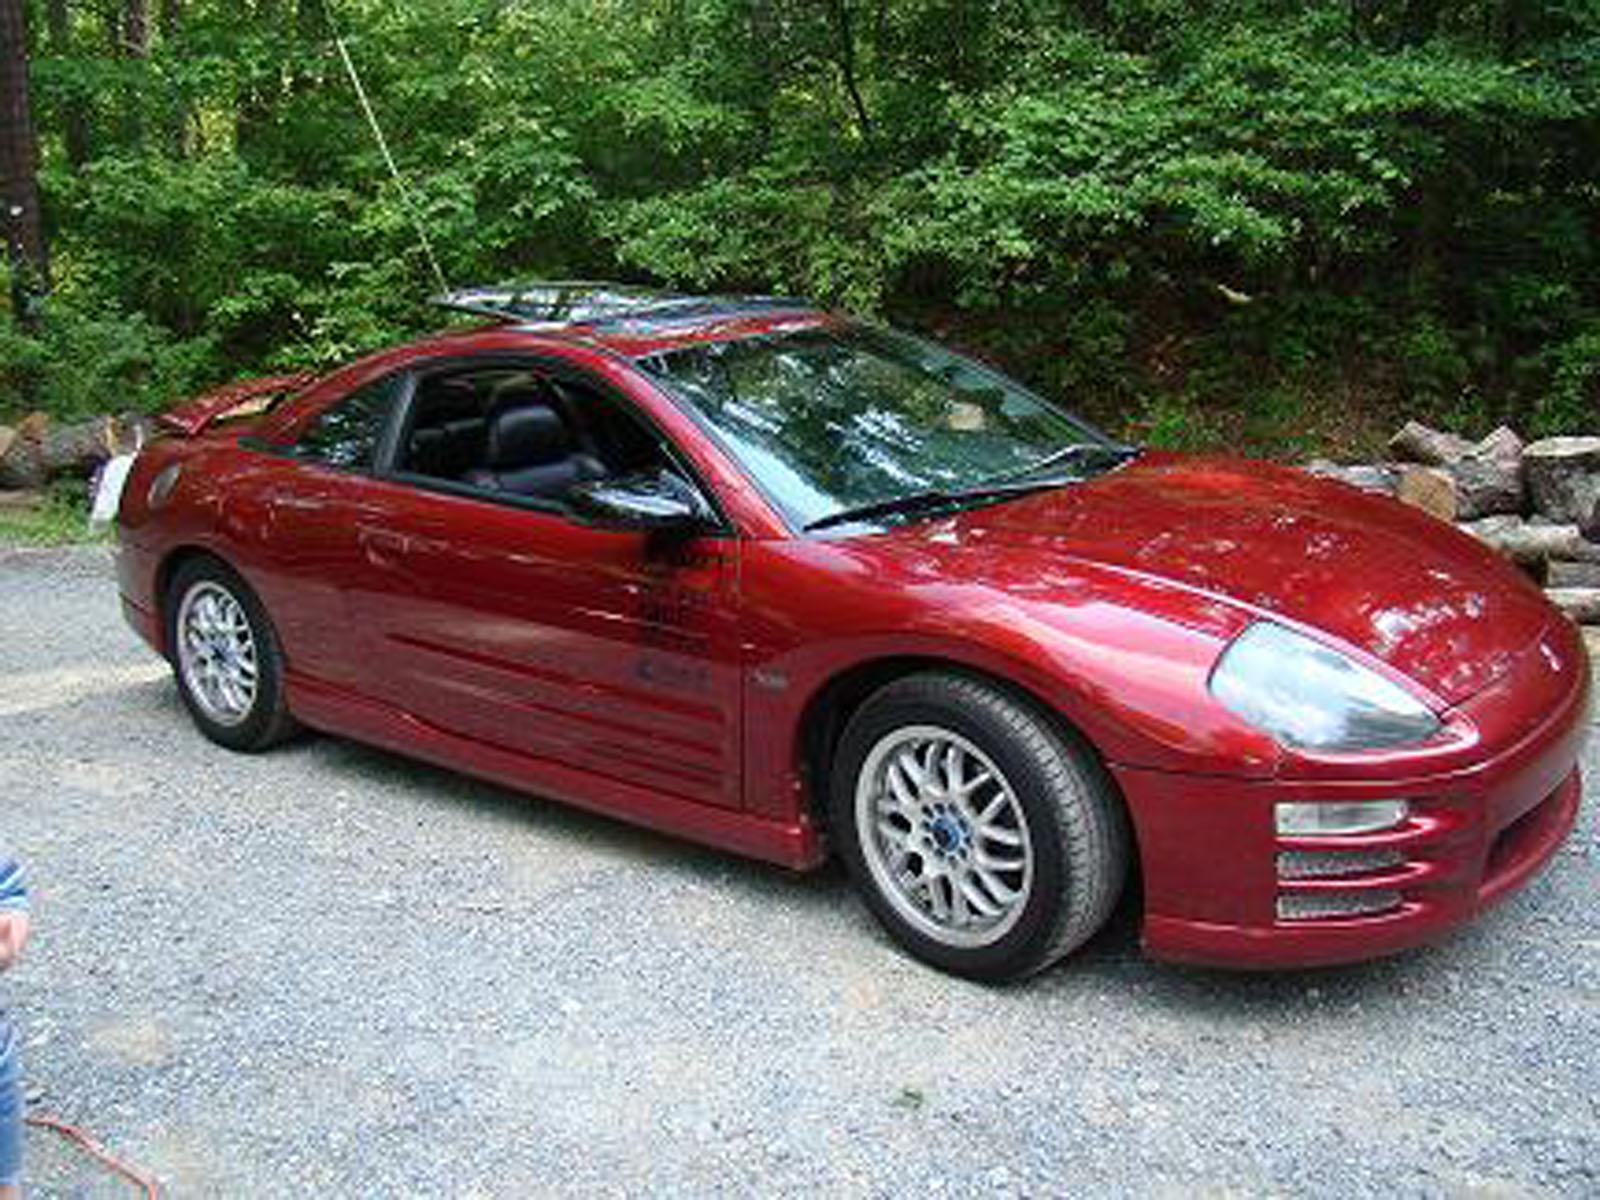 2001 Mitsubishi 2001  Eclipse  Gt V6 For Sale